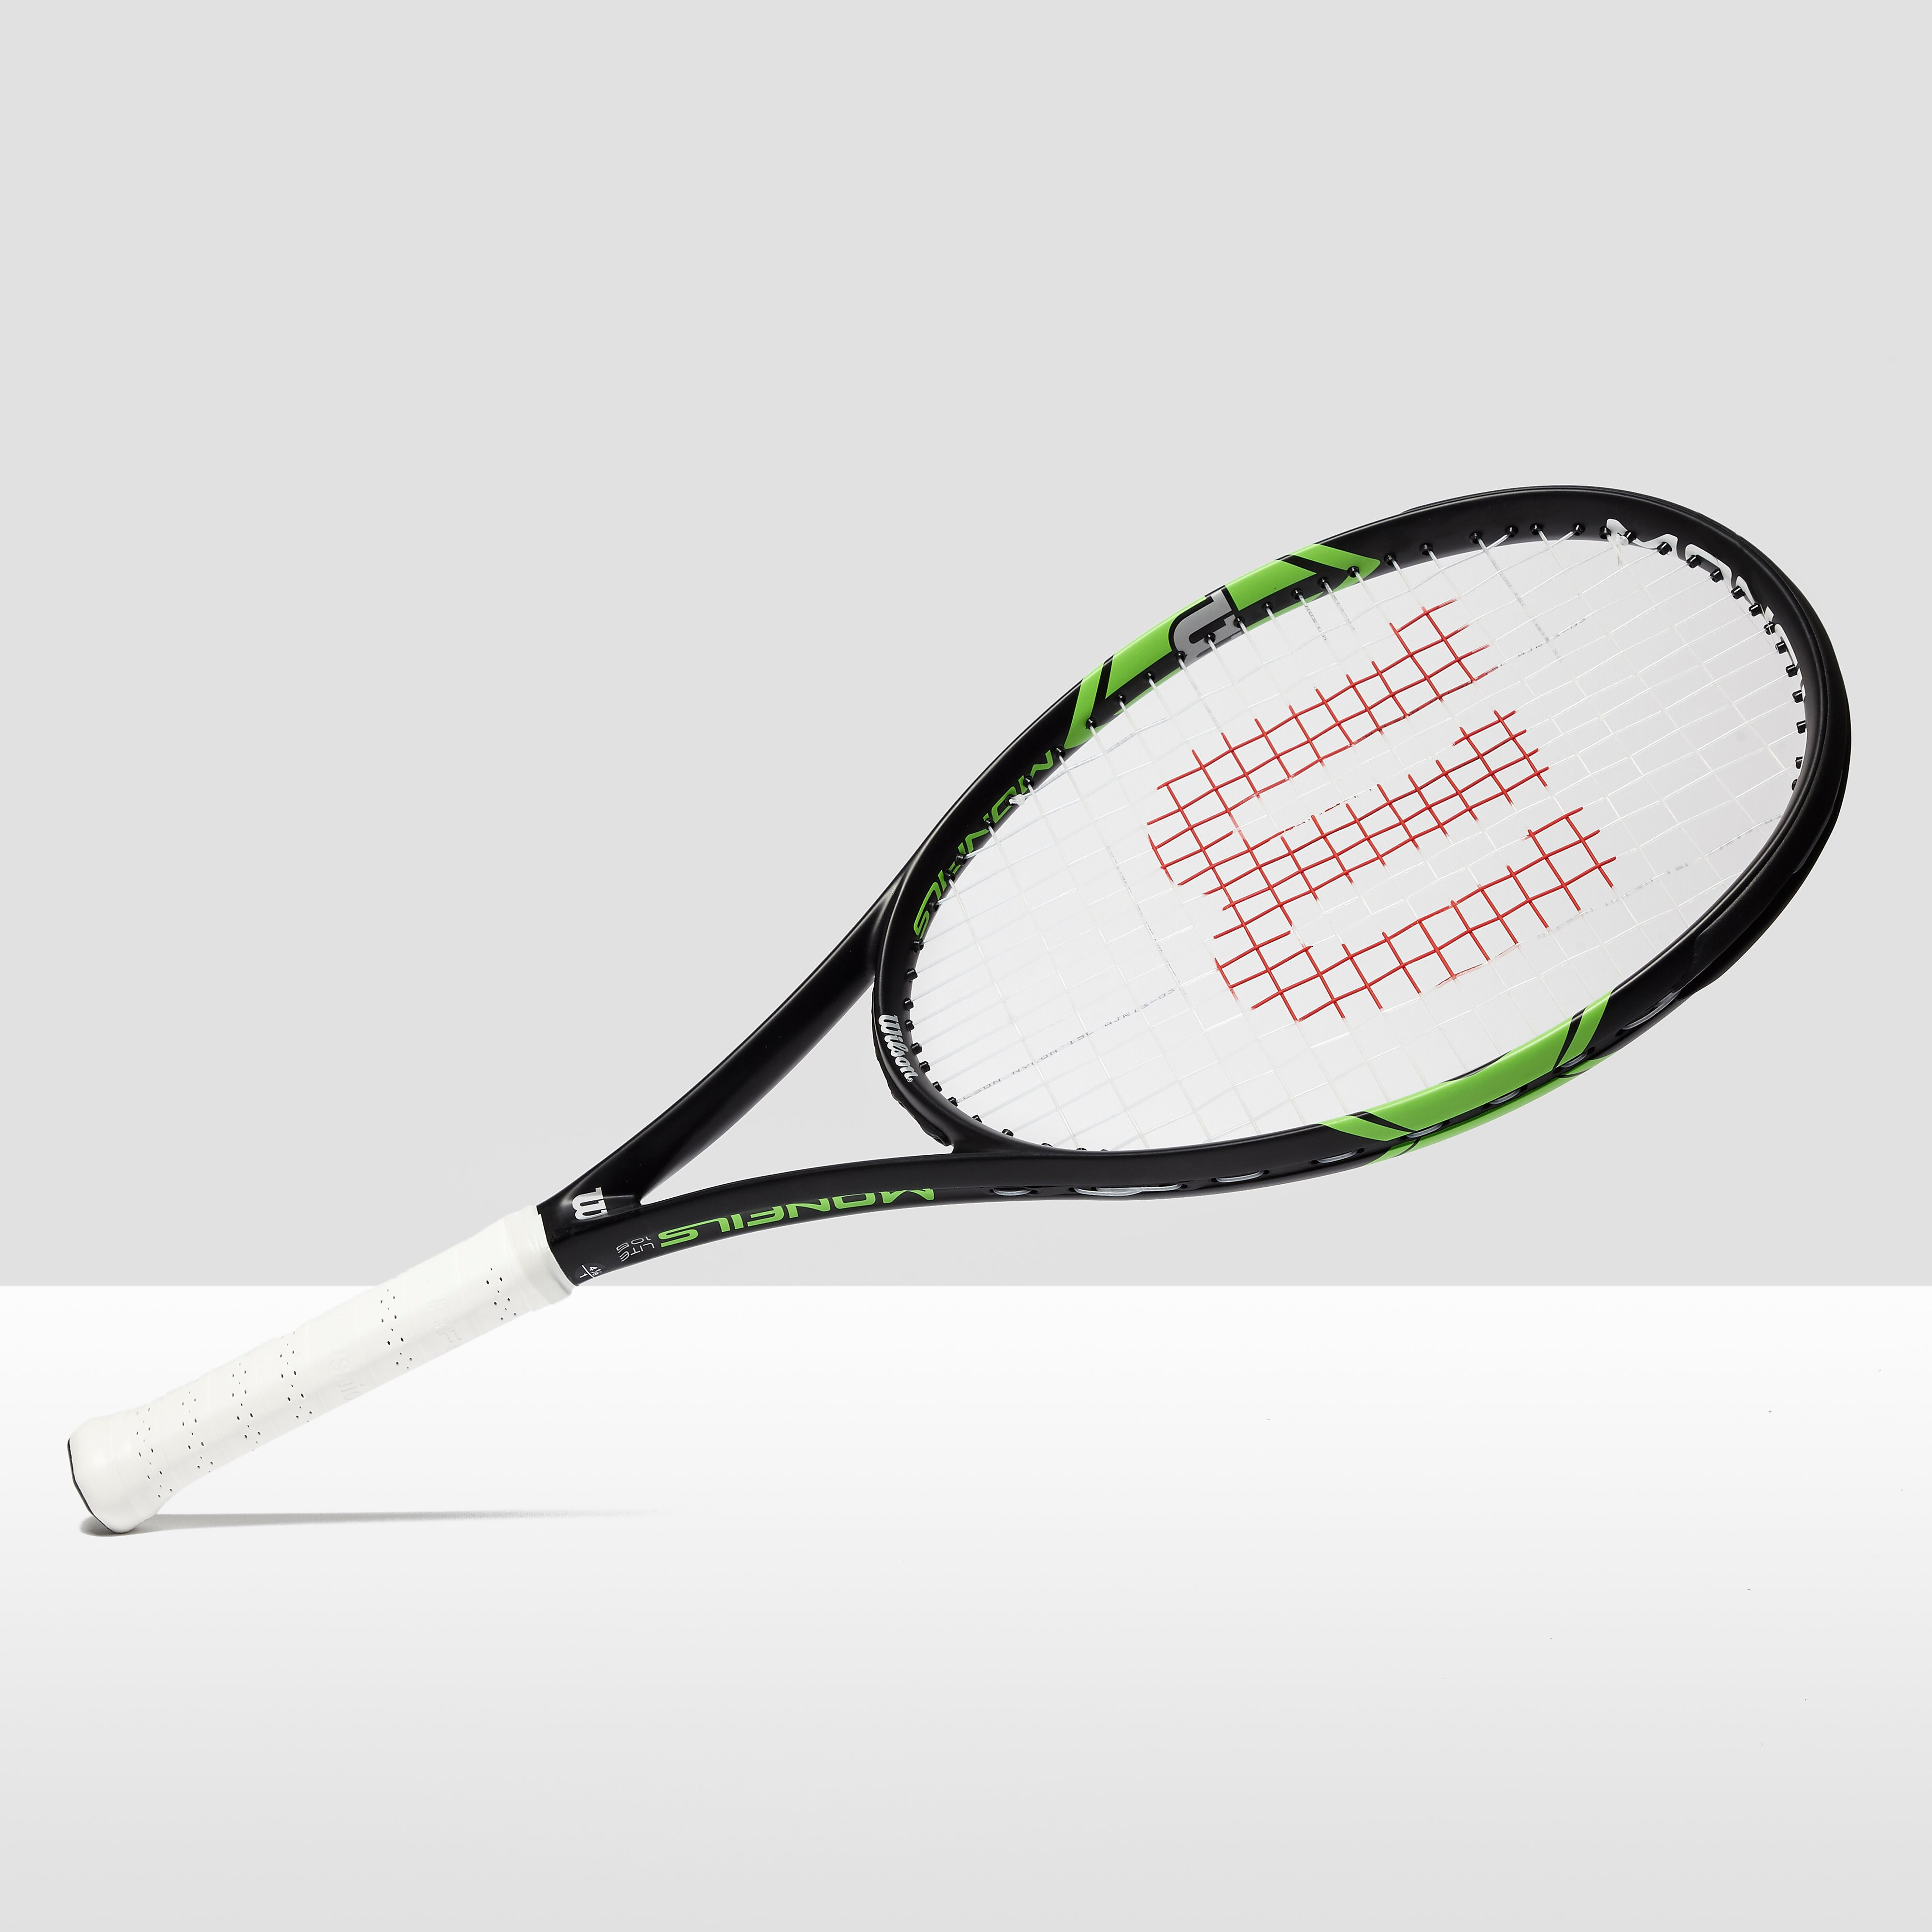 Wilson Monfils Lite 105 Tennis Racket